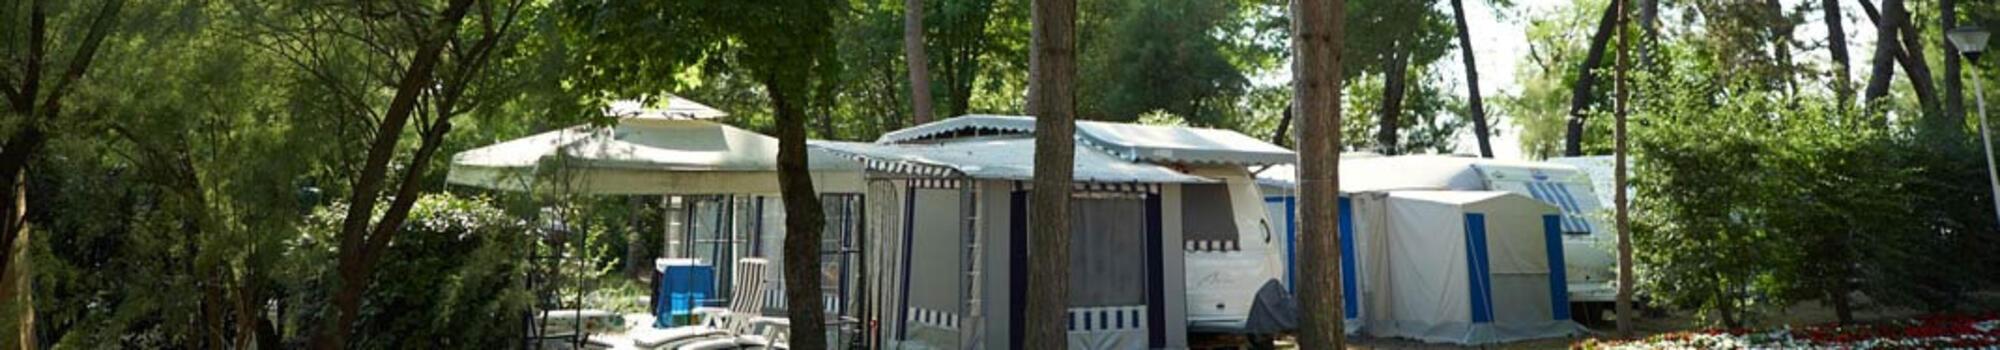 Offerta di luglio: speciale piazzole in camping village a Bibione